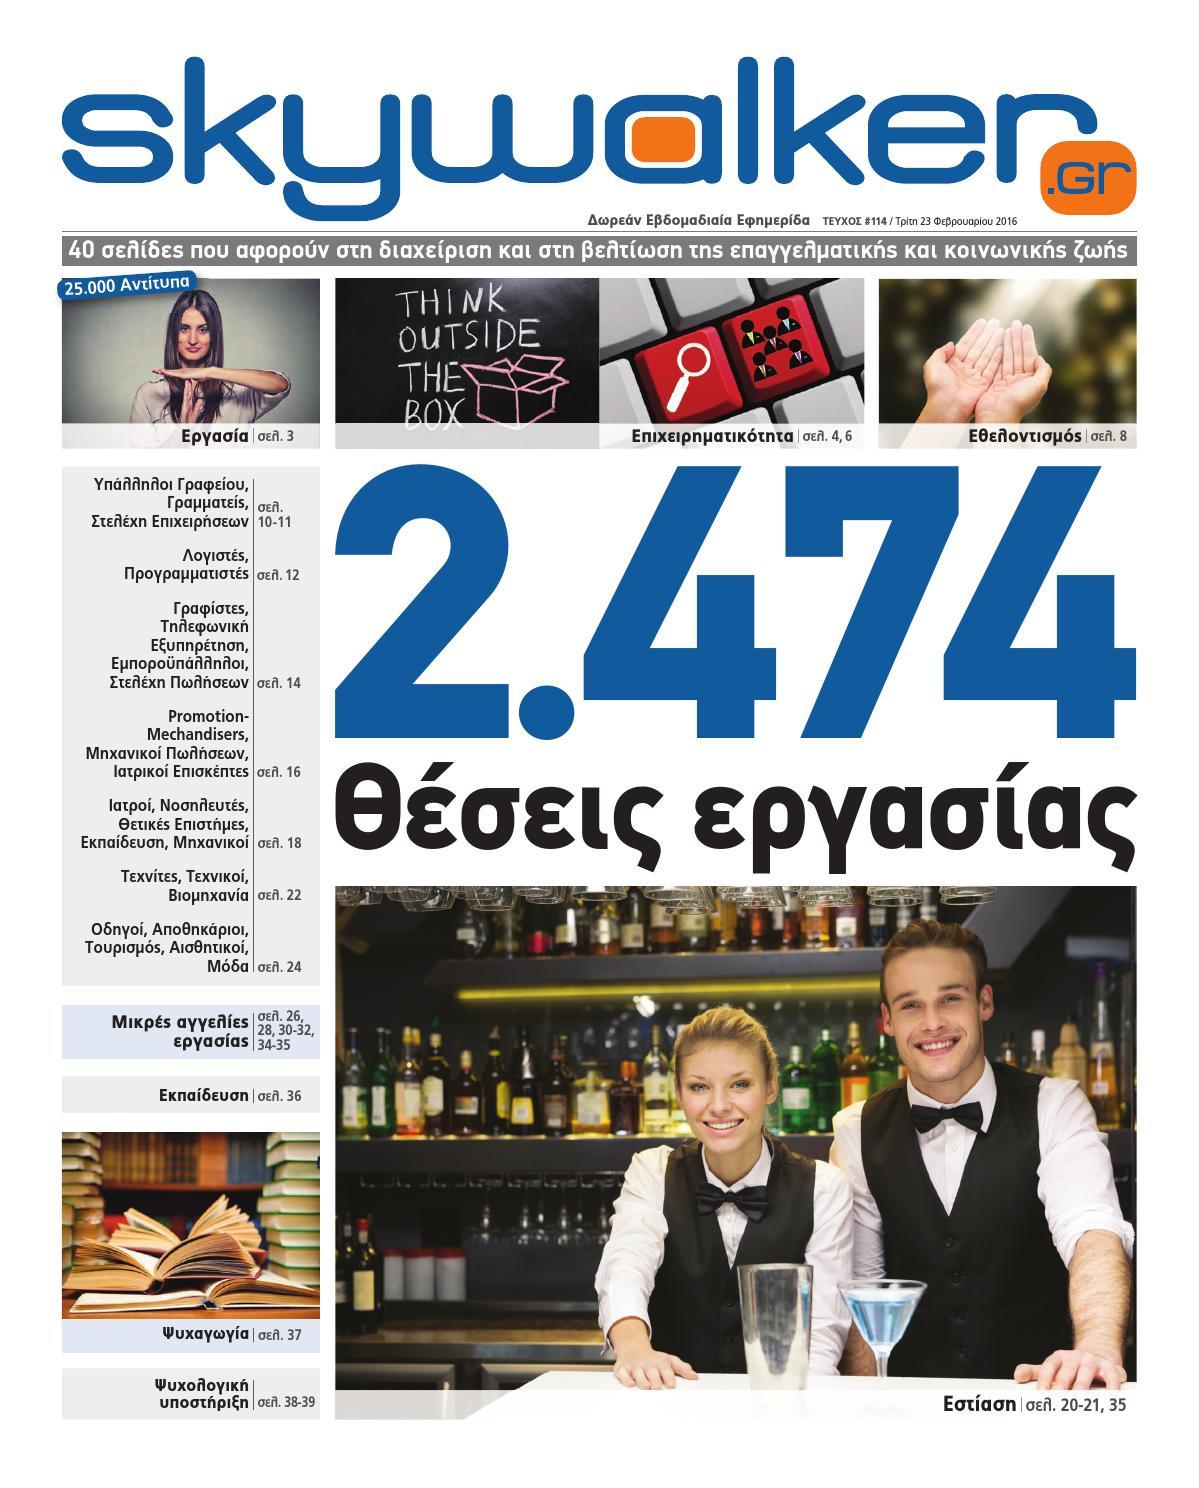 Skywalker 23 February 2016 by Skywalker GR - issuu 94afc4426be